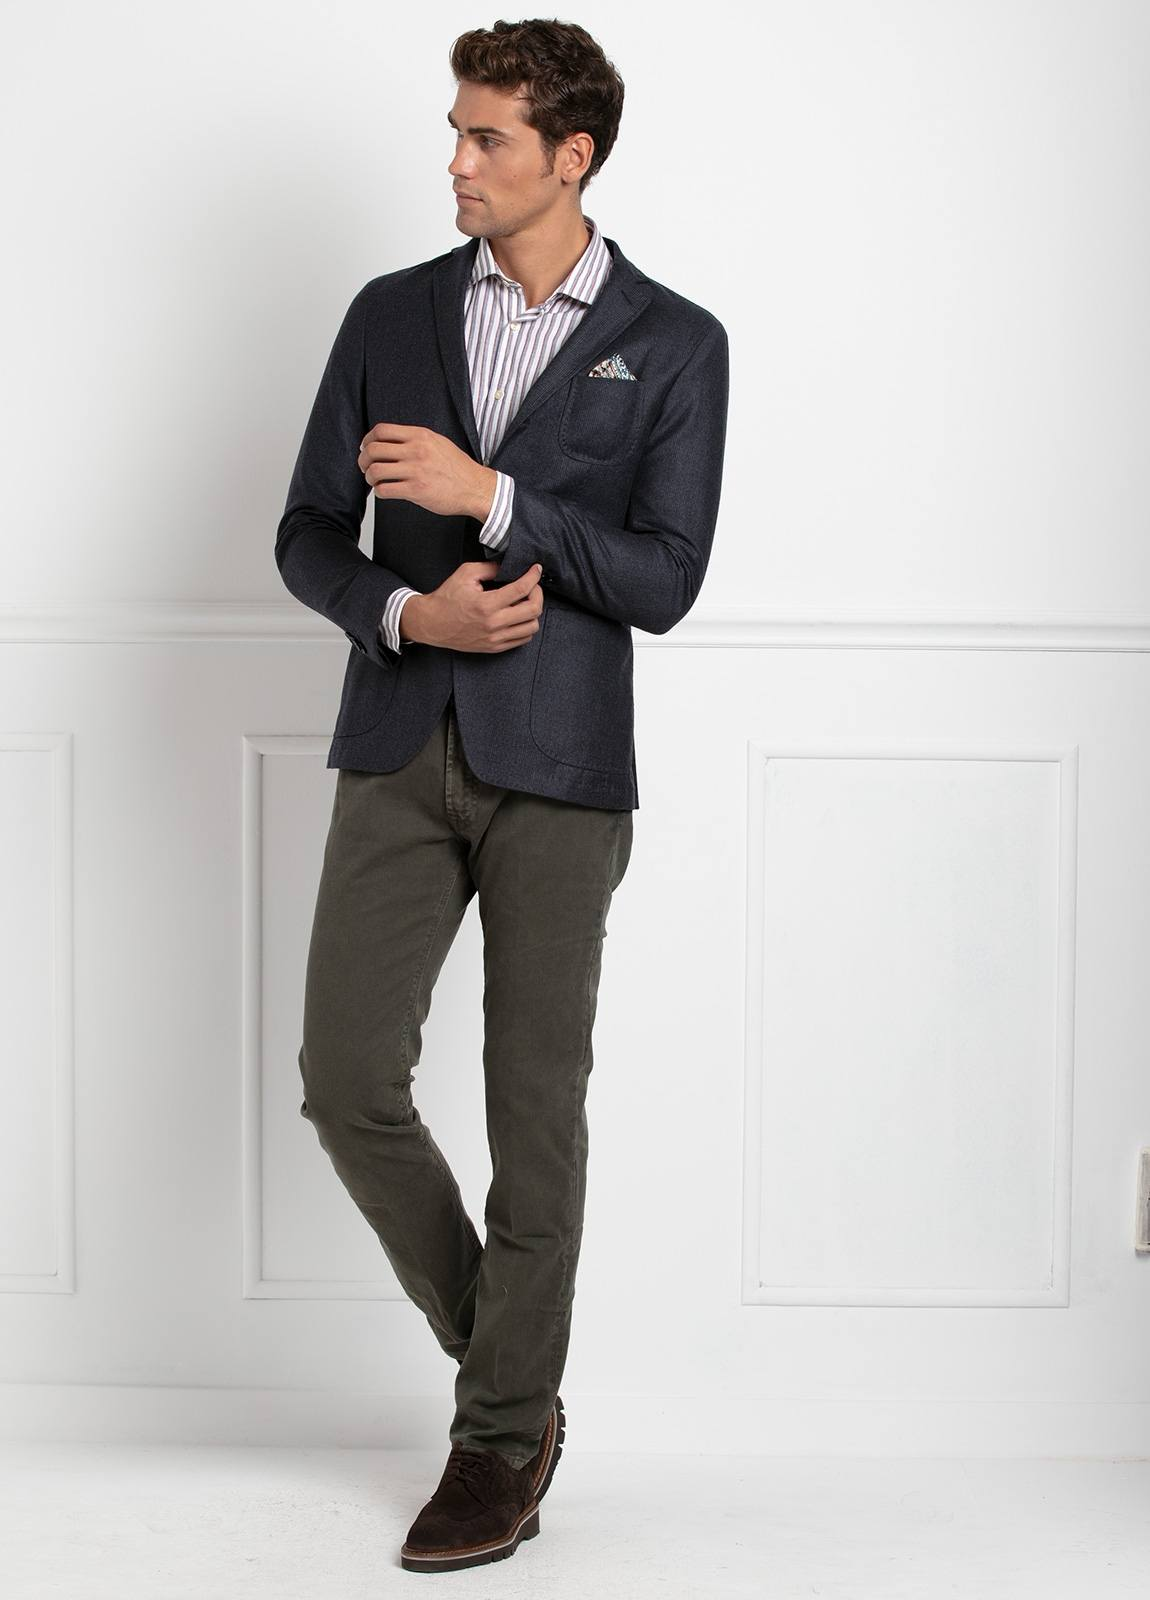 Americana SOFT JACKET Slim Fit, diseño tipo Cheviot cuadro vichy color gris. 100% Lana.